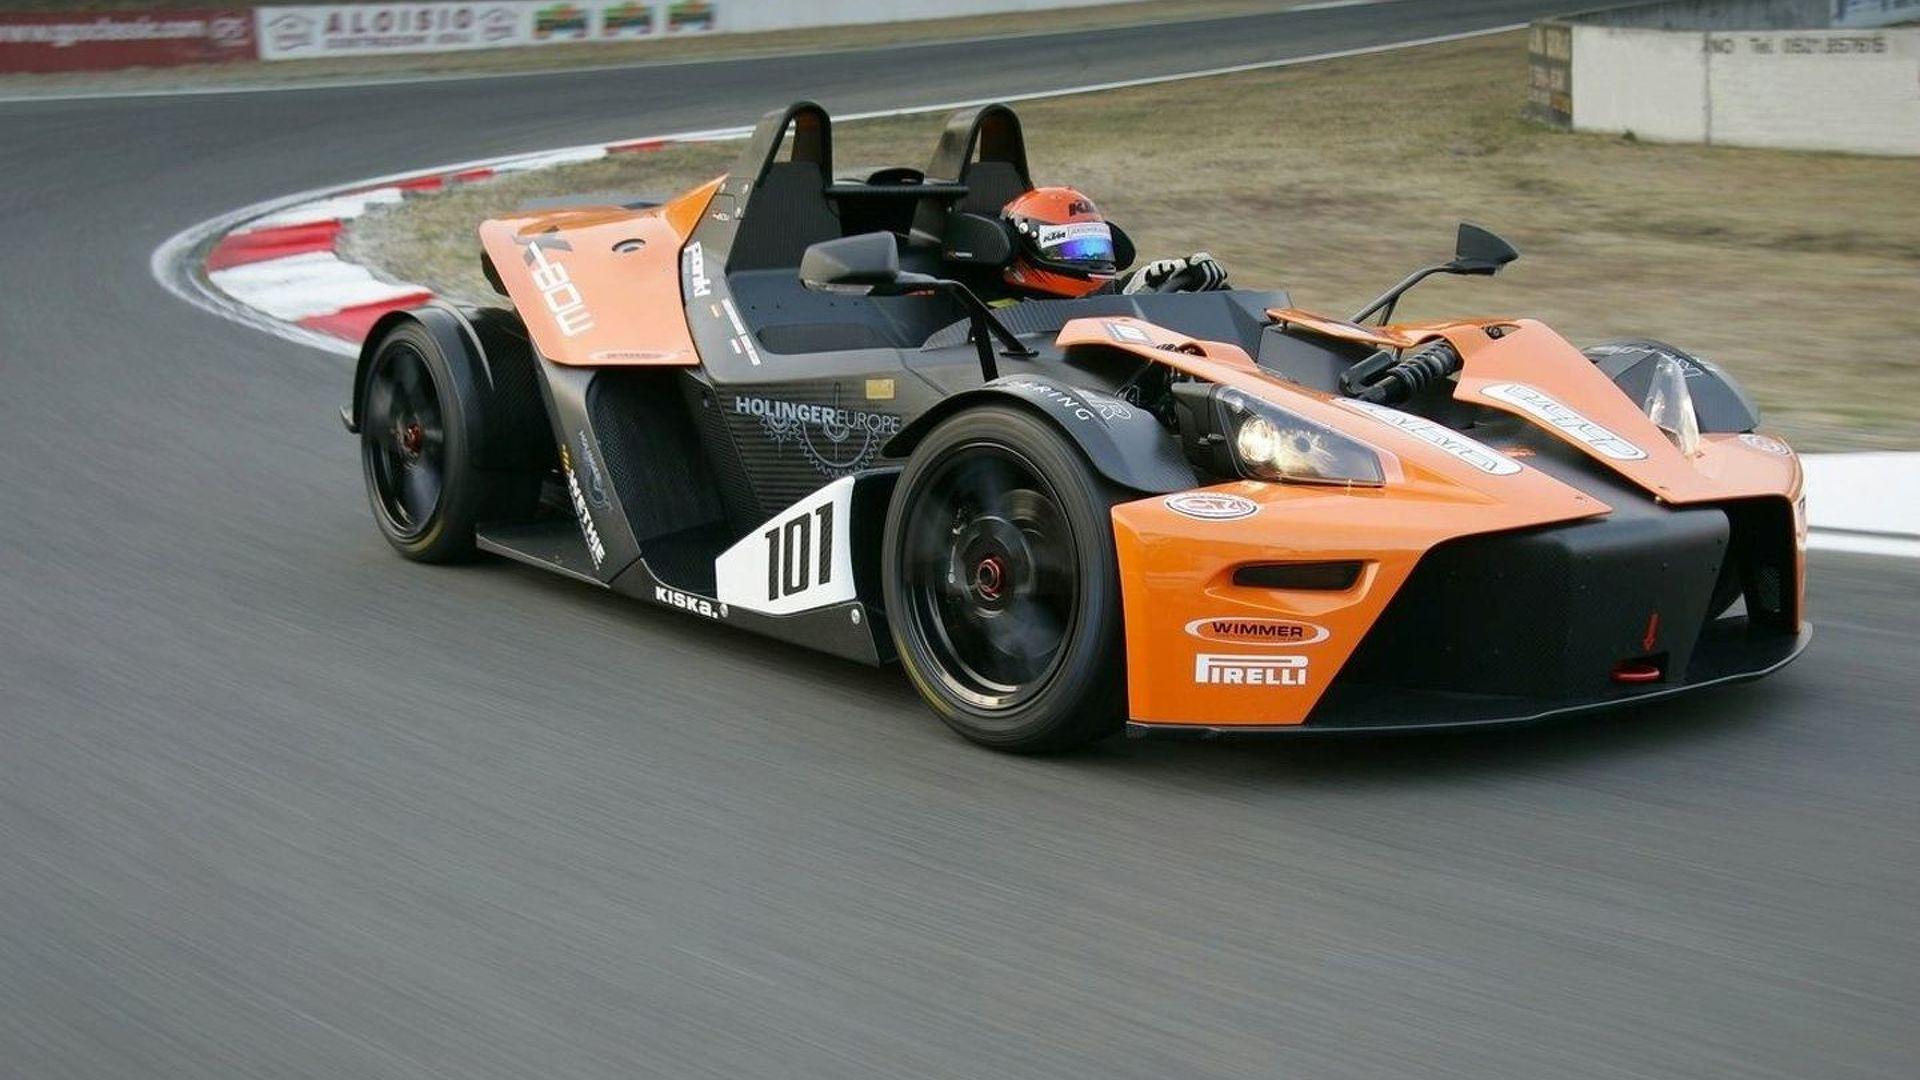 KTM X-Bow RACE Model Priced at EUR 82,900 Ex-works